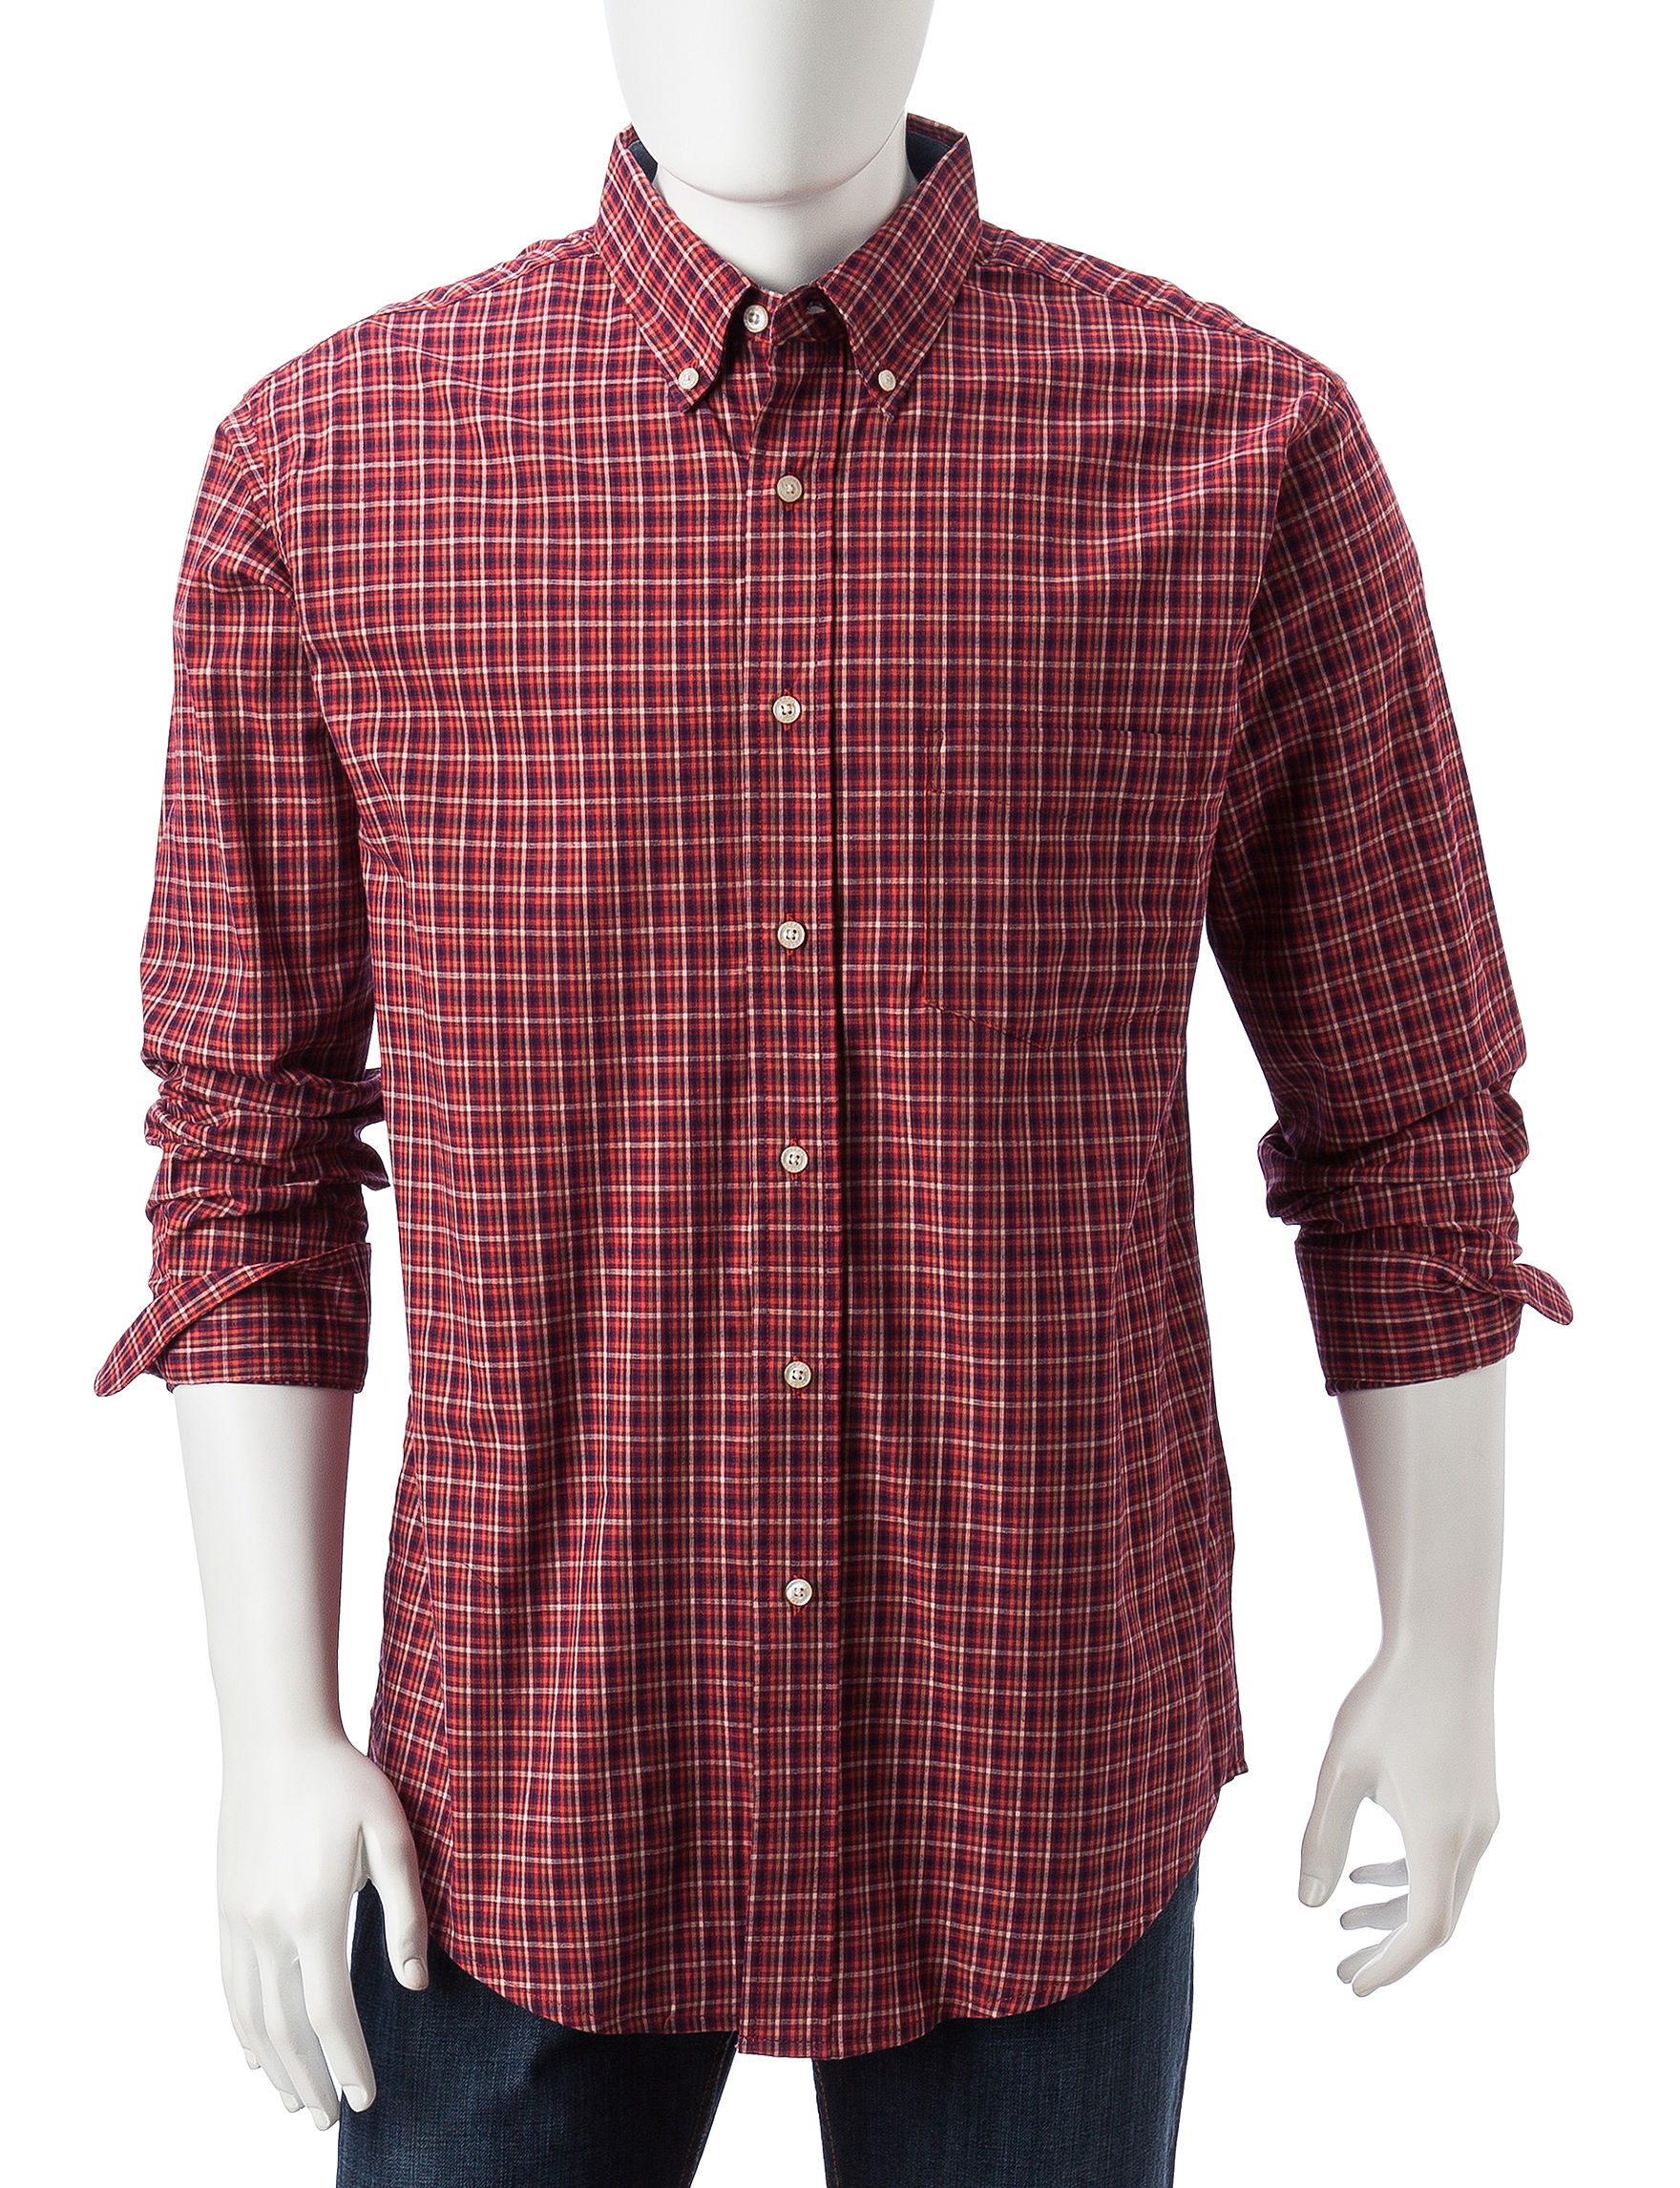 Haggar Red Casual Button Down Shirts